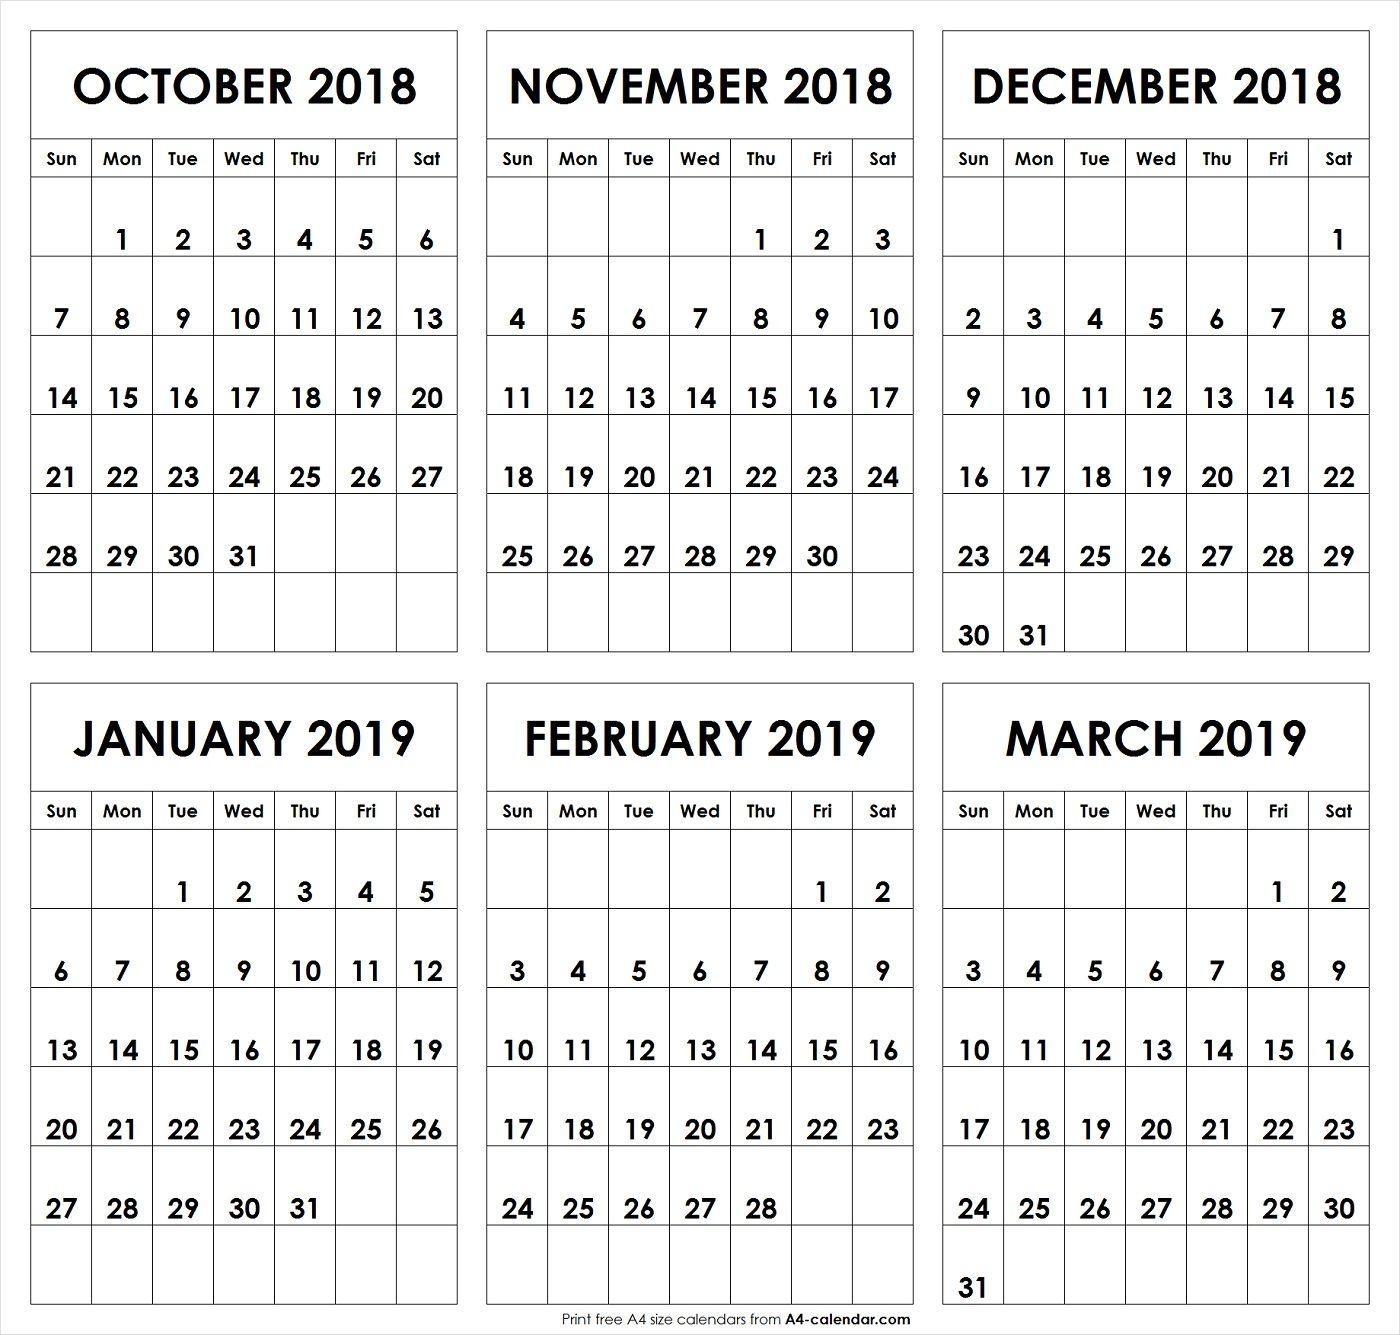 October 2018 To March 2019 October Calendar March